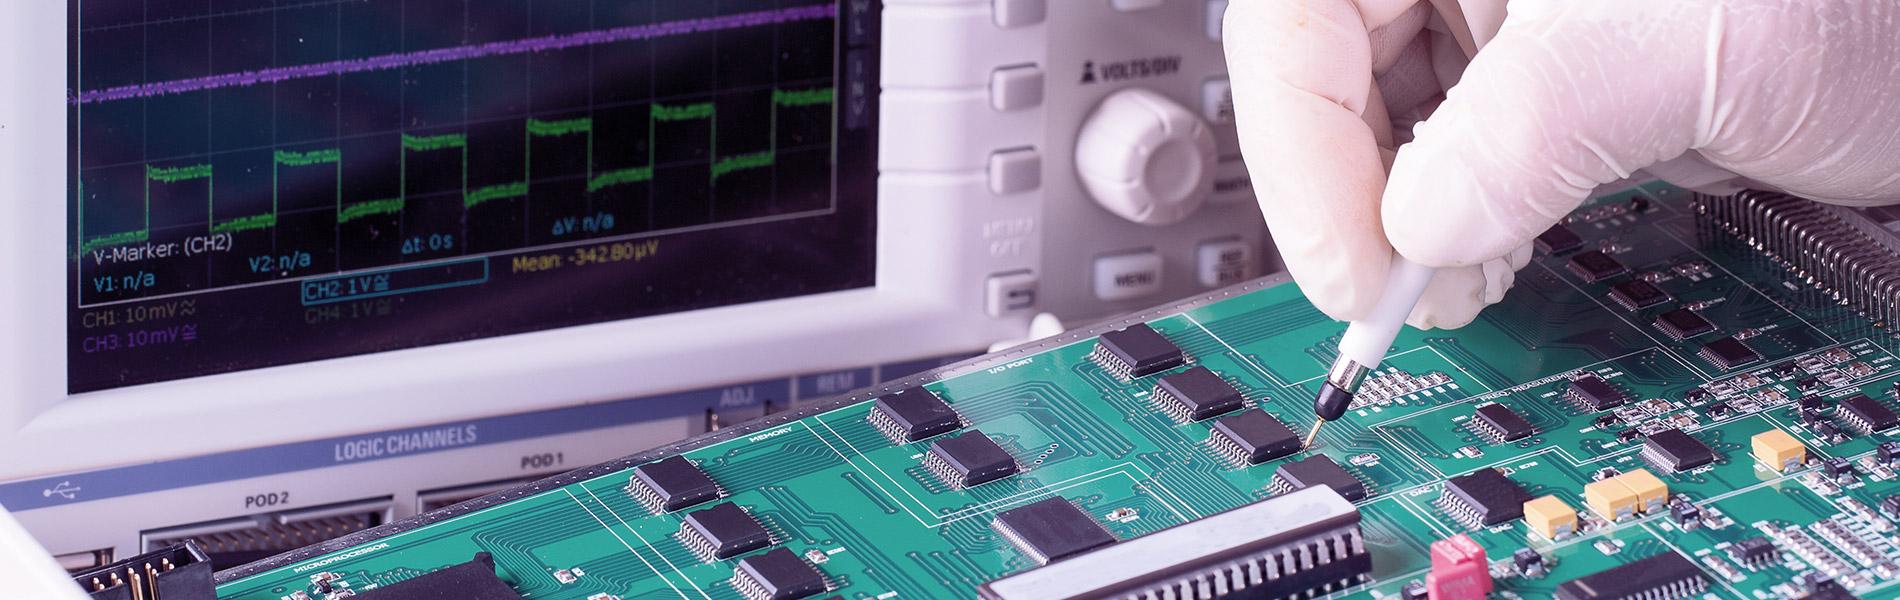 Test di sicurezza elettrica ed elettronica